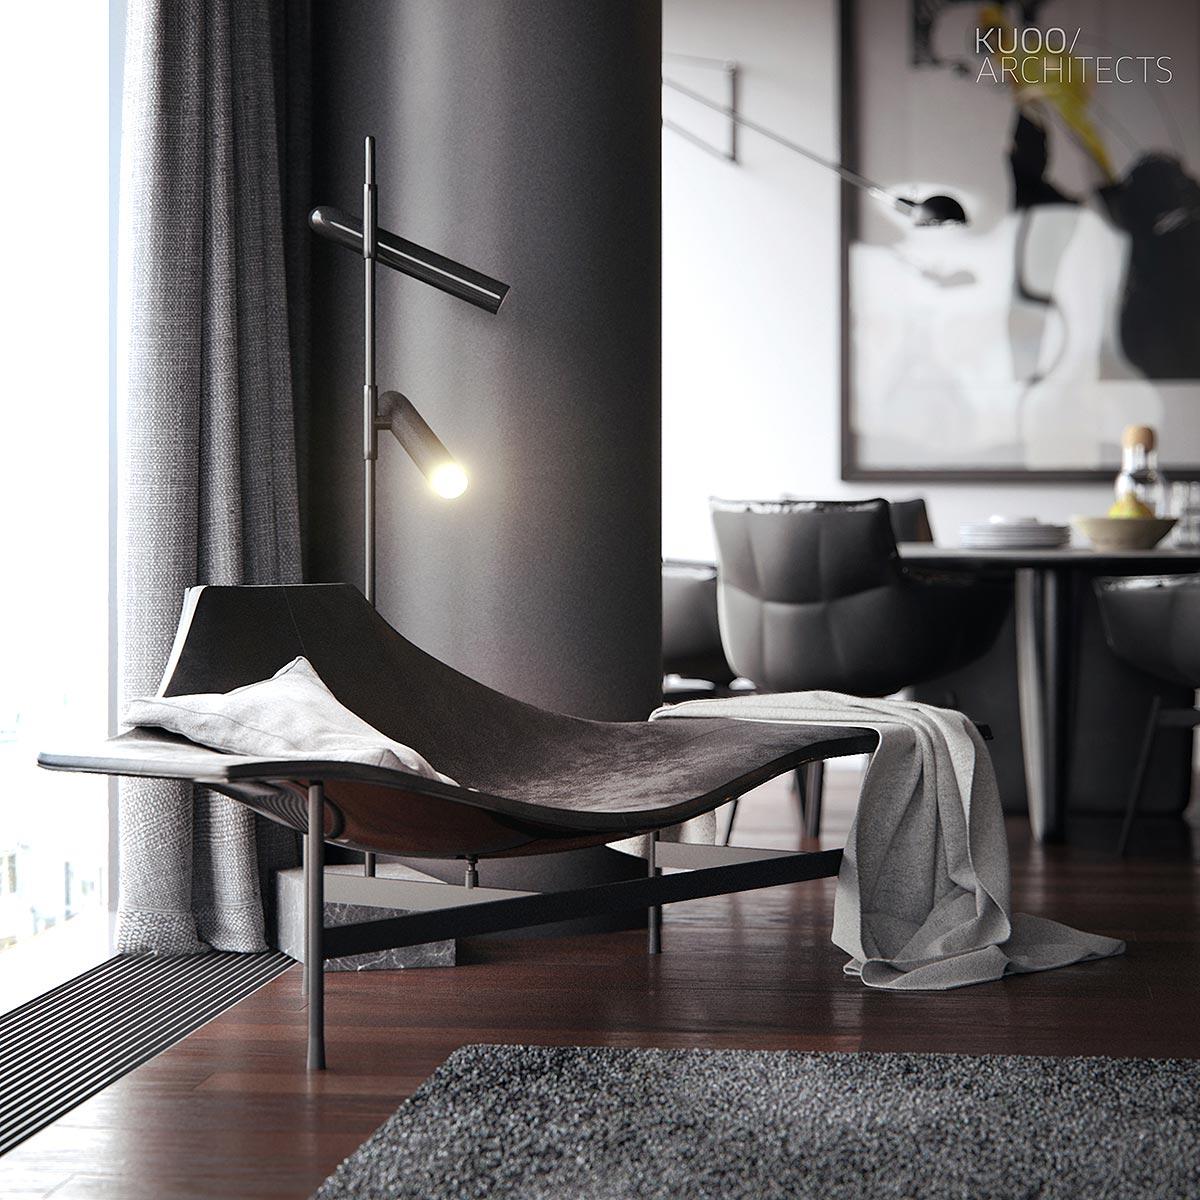 _kuoo_architects_warsaw_cosmopolitan_interiors_contemporary-3